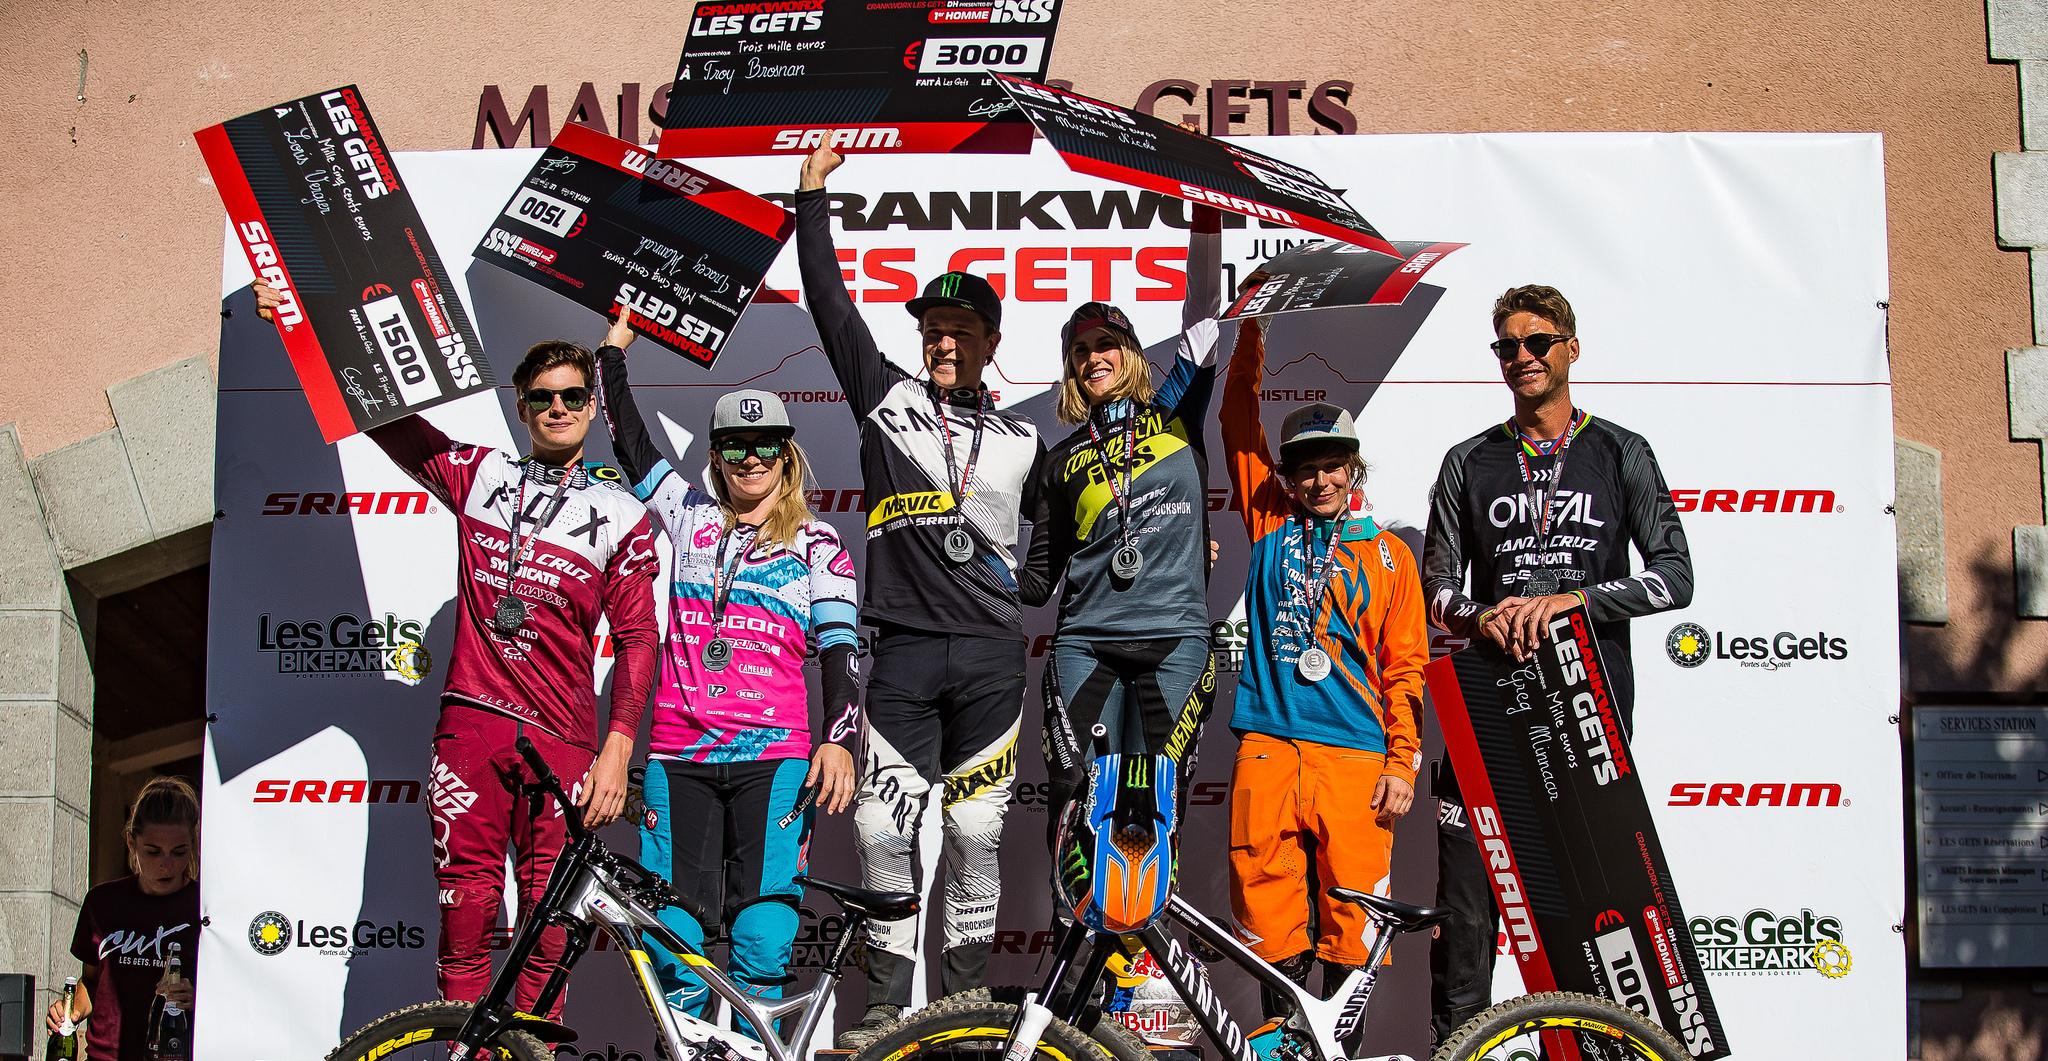 Crankworx Les Gets 2017: Brosnan & Nicole dominieren Downhill-Rennen